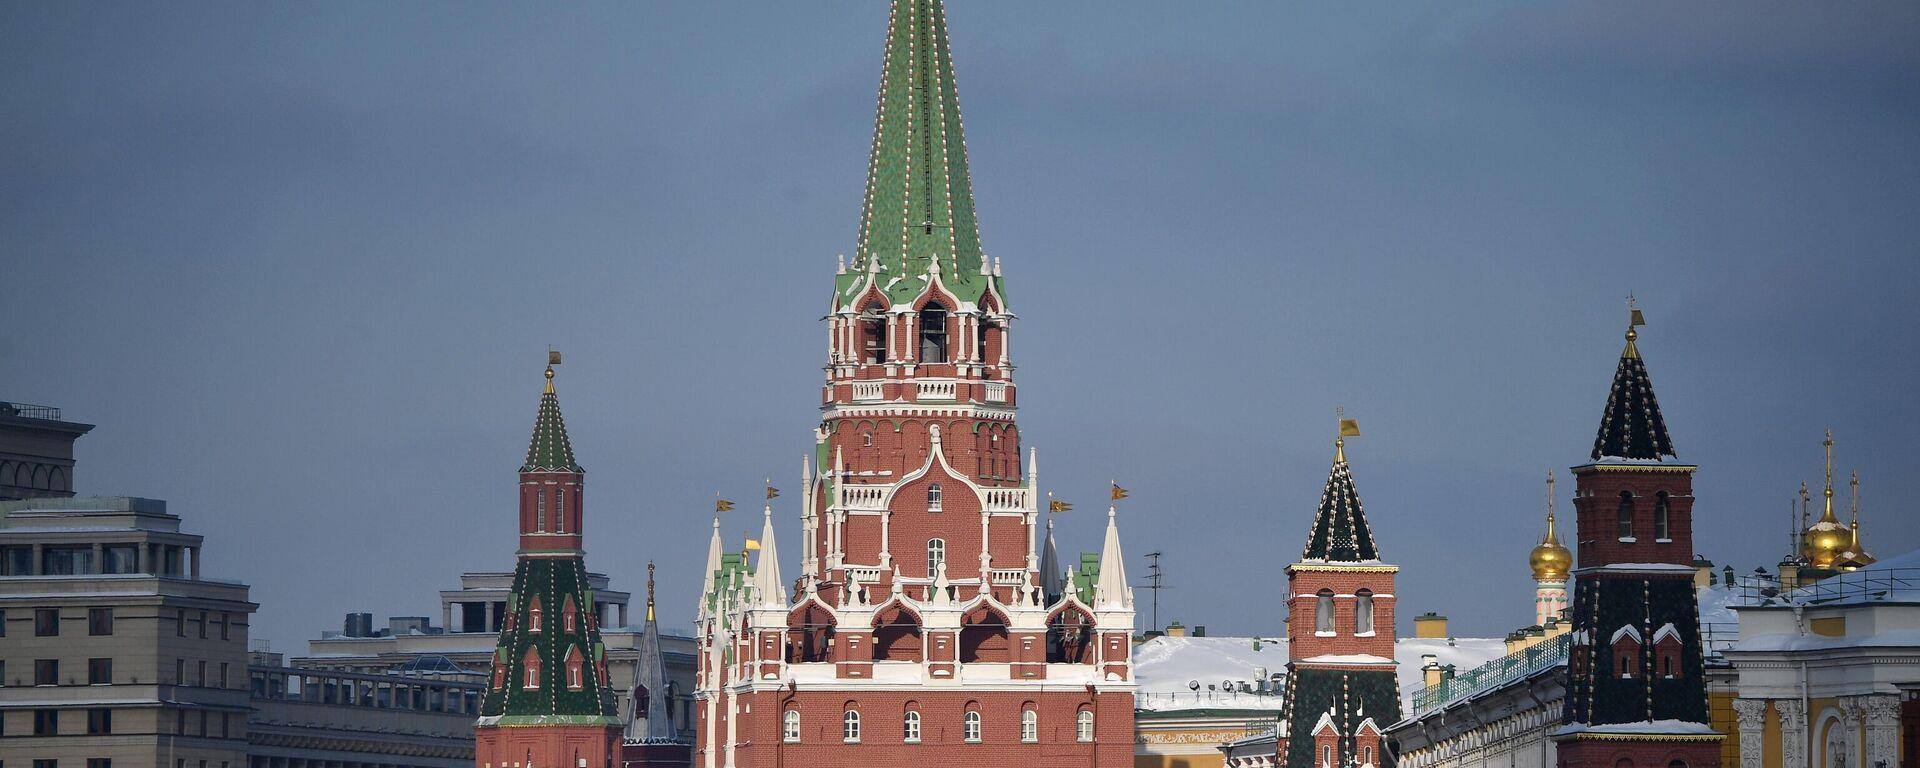 El Kremlin de Moscú, Rusia - Sputnik Mundo, 1920, 16.06.2021